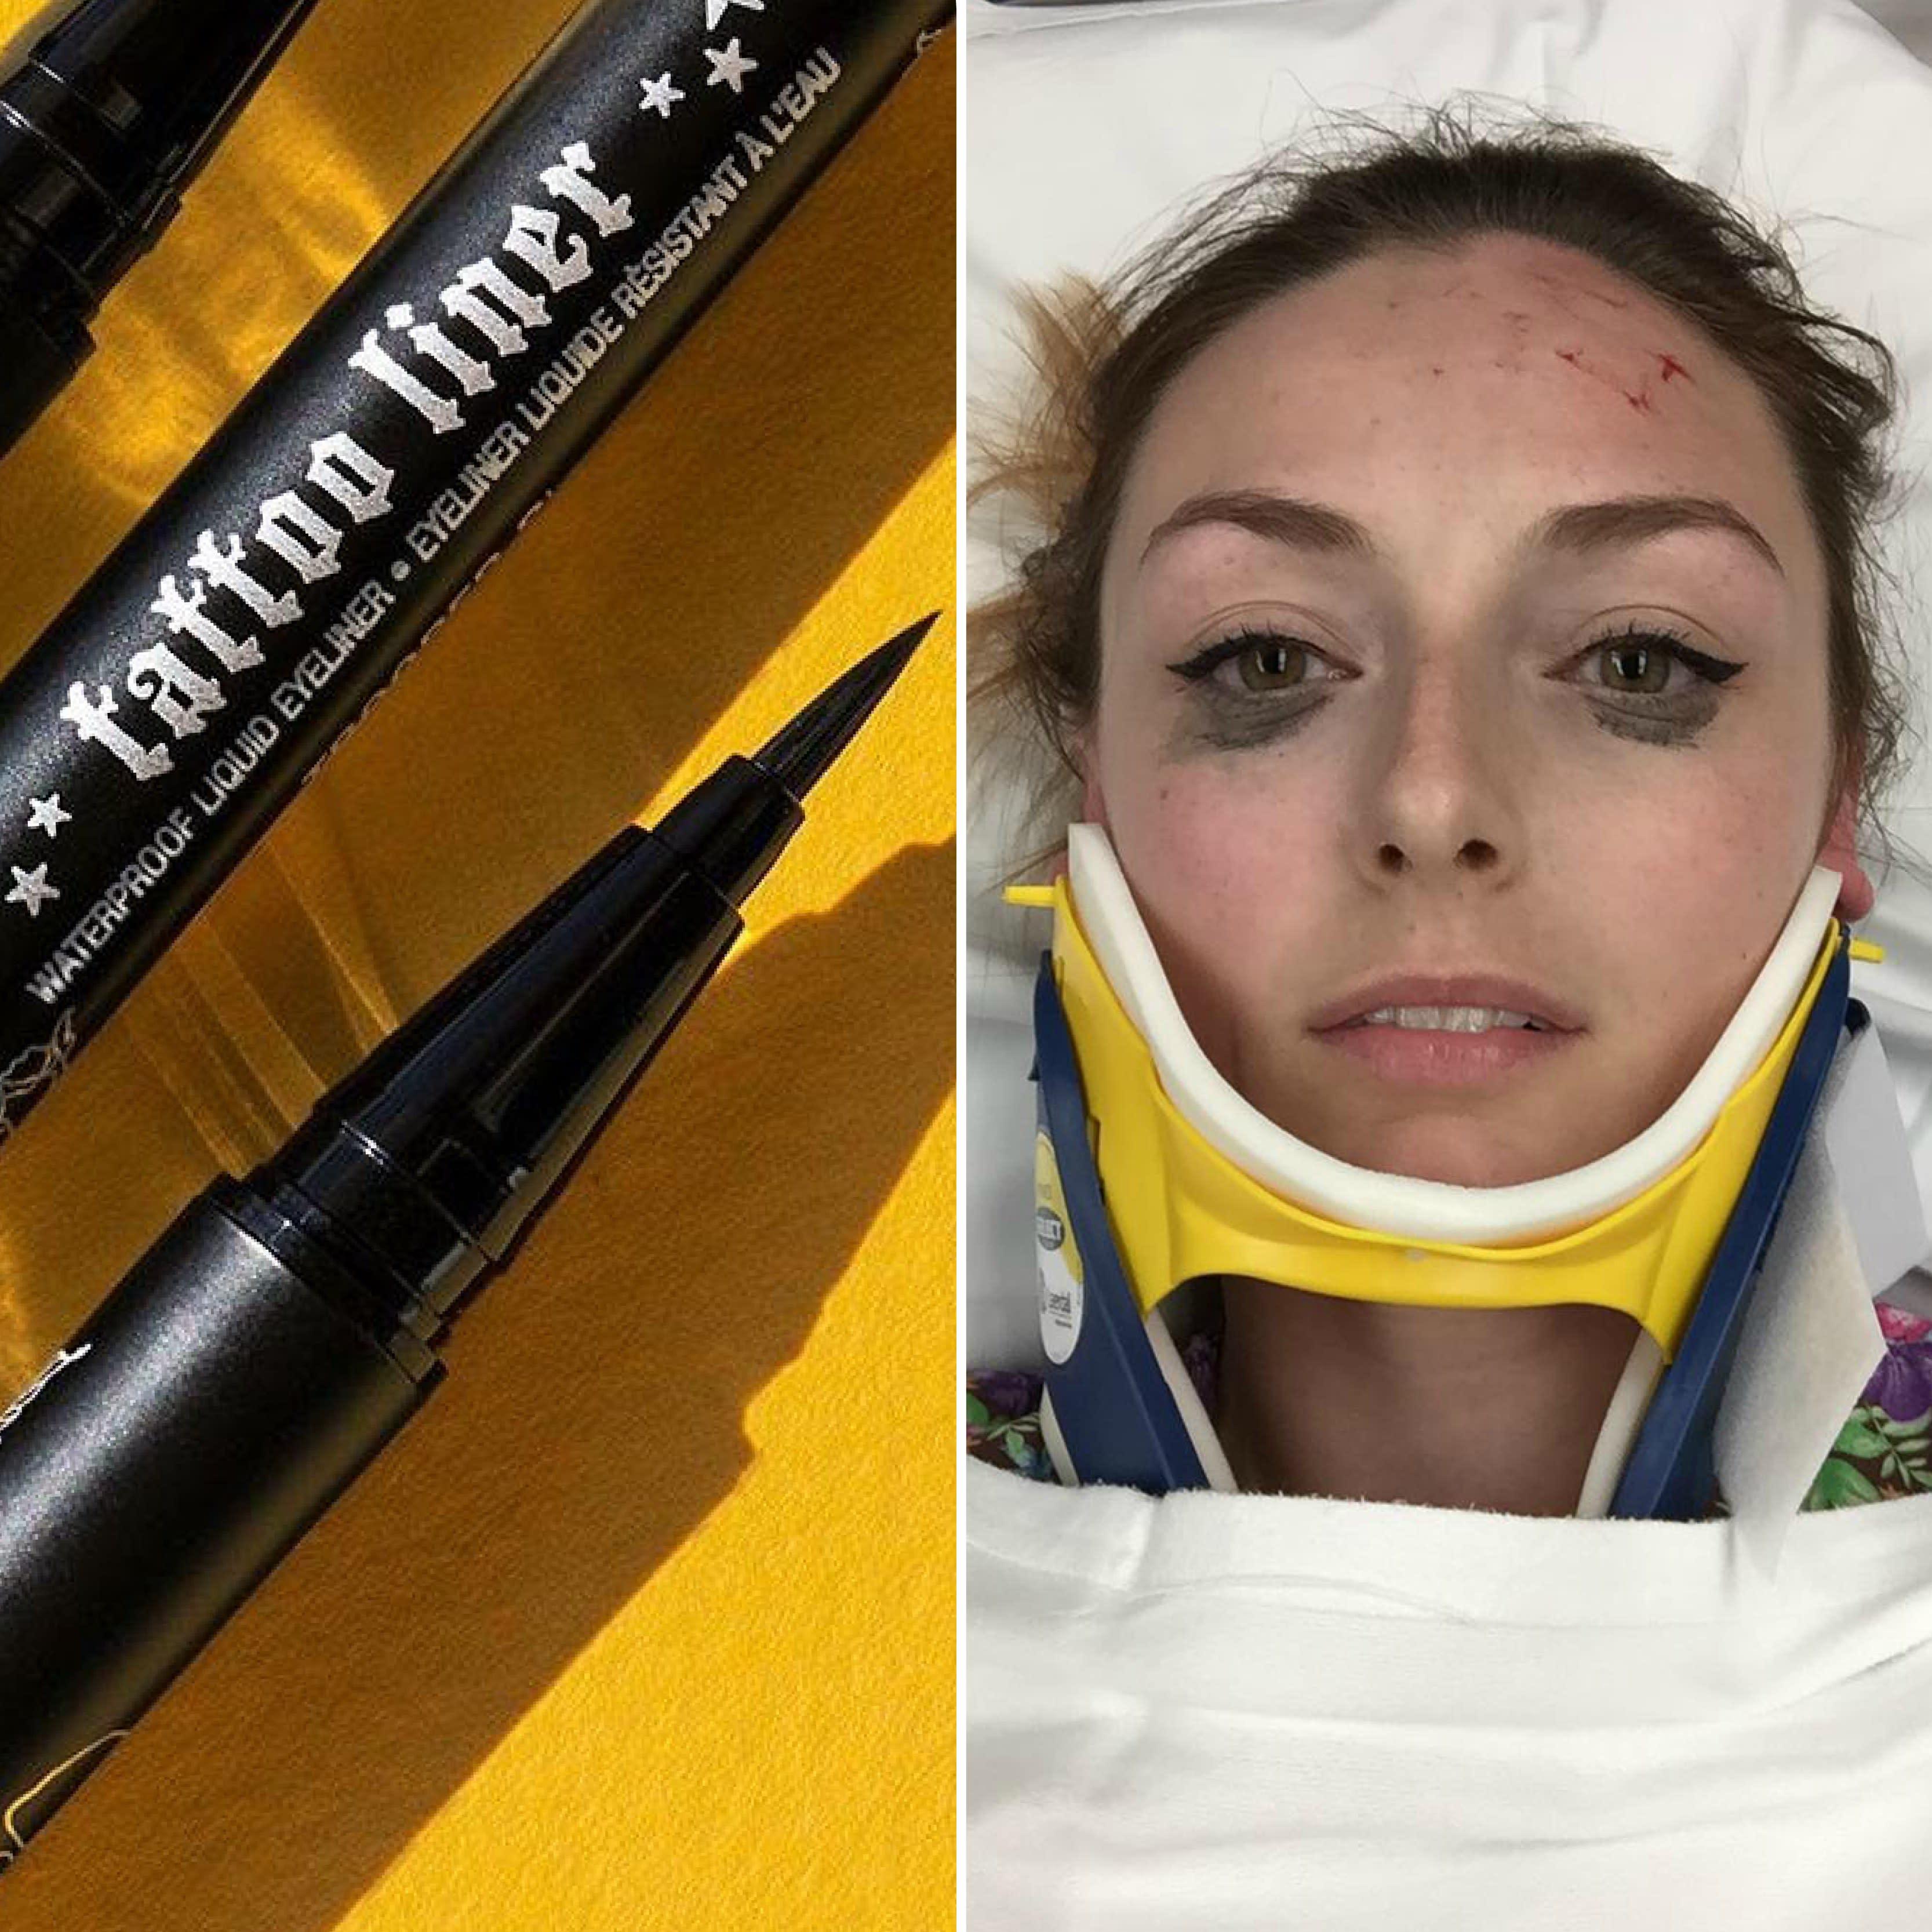 Kat Von D Tattoo Liner Car Accident Makeup Review Goes Viral